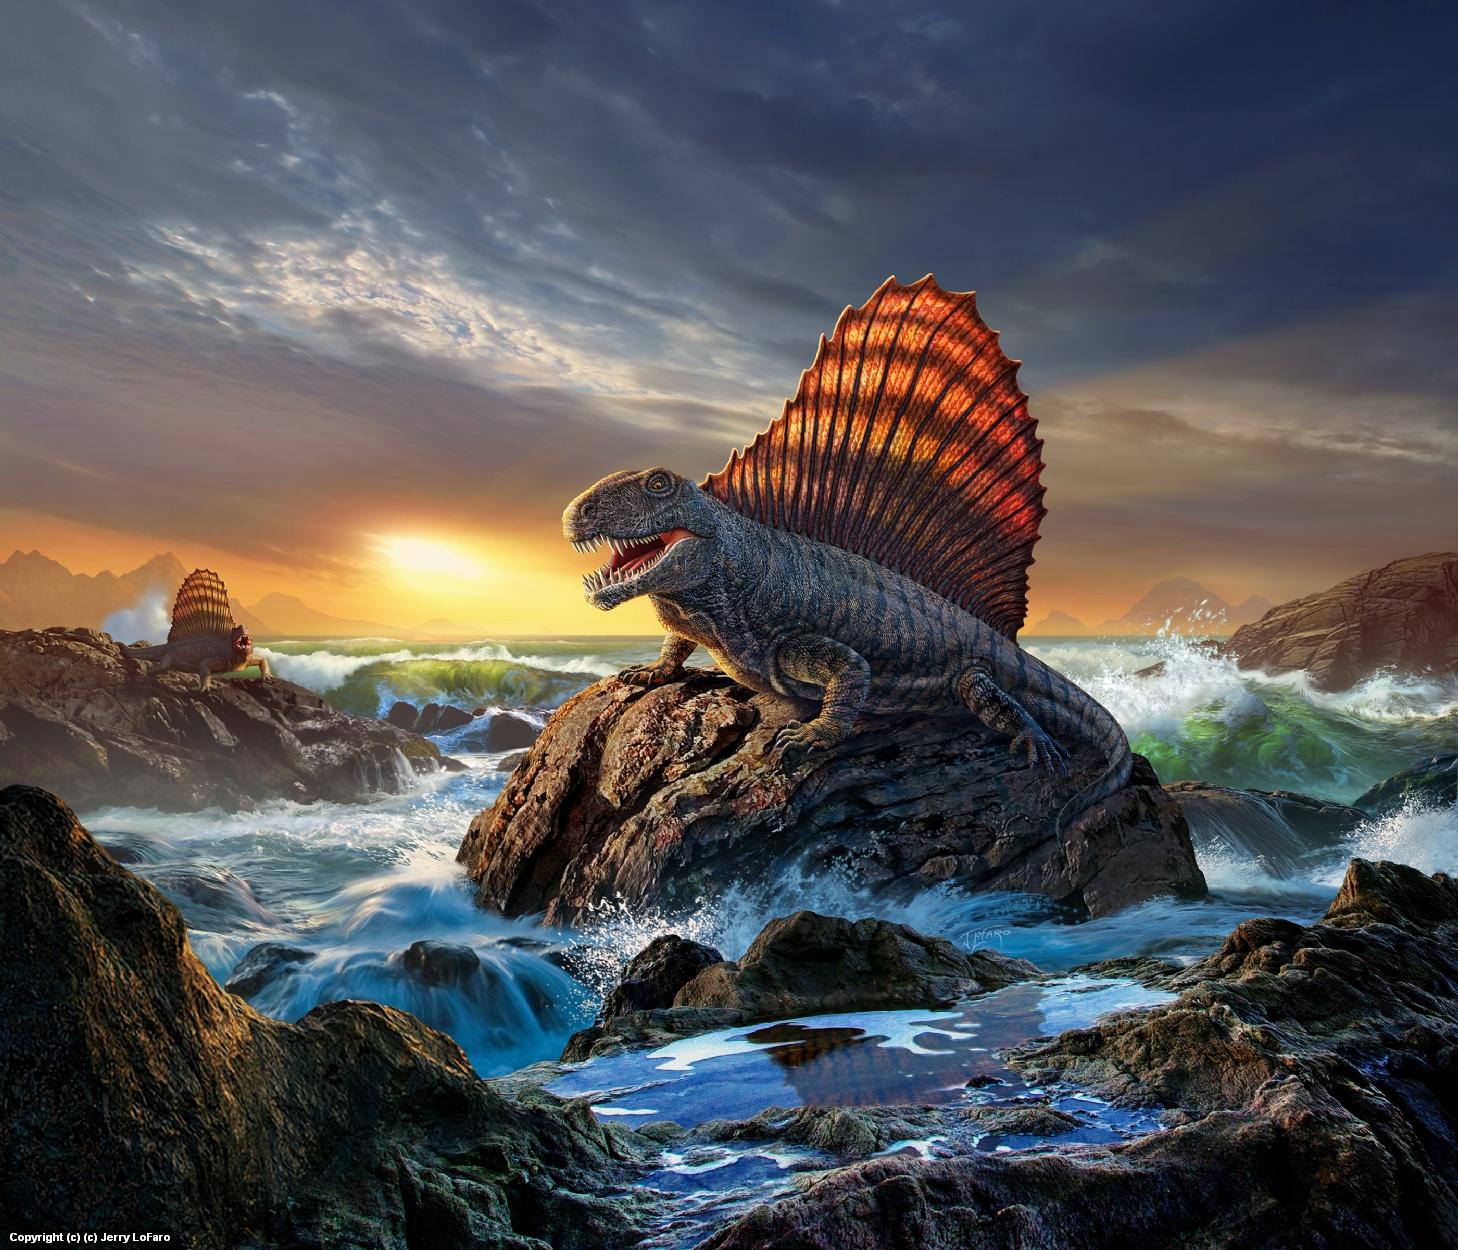 Dimetrodon Artwork by jerry lofaro